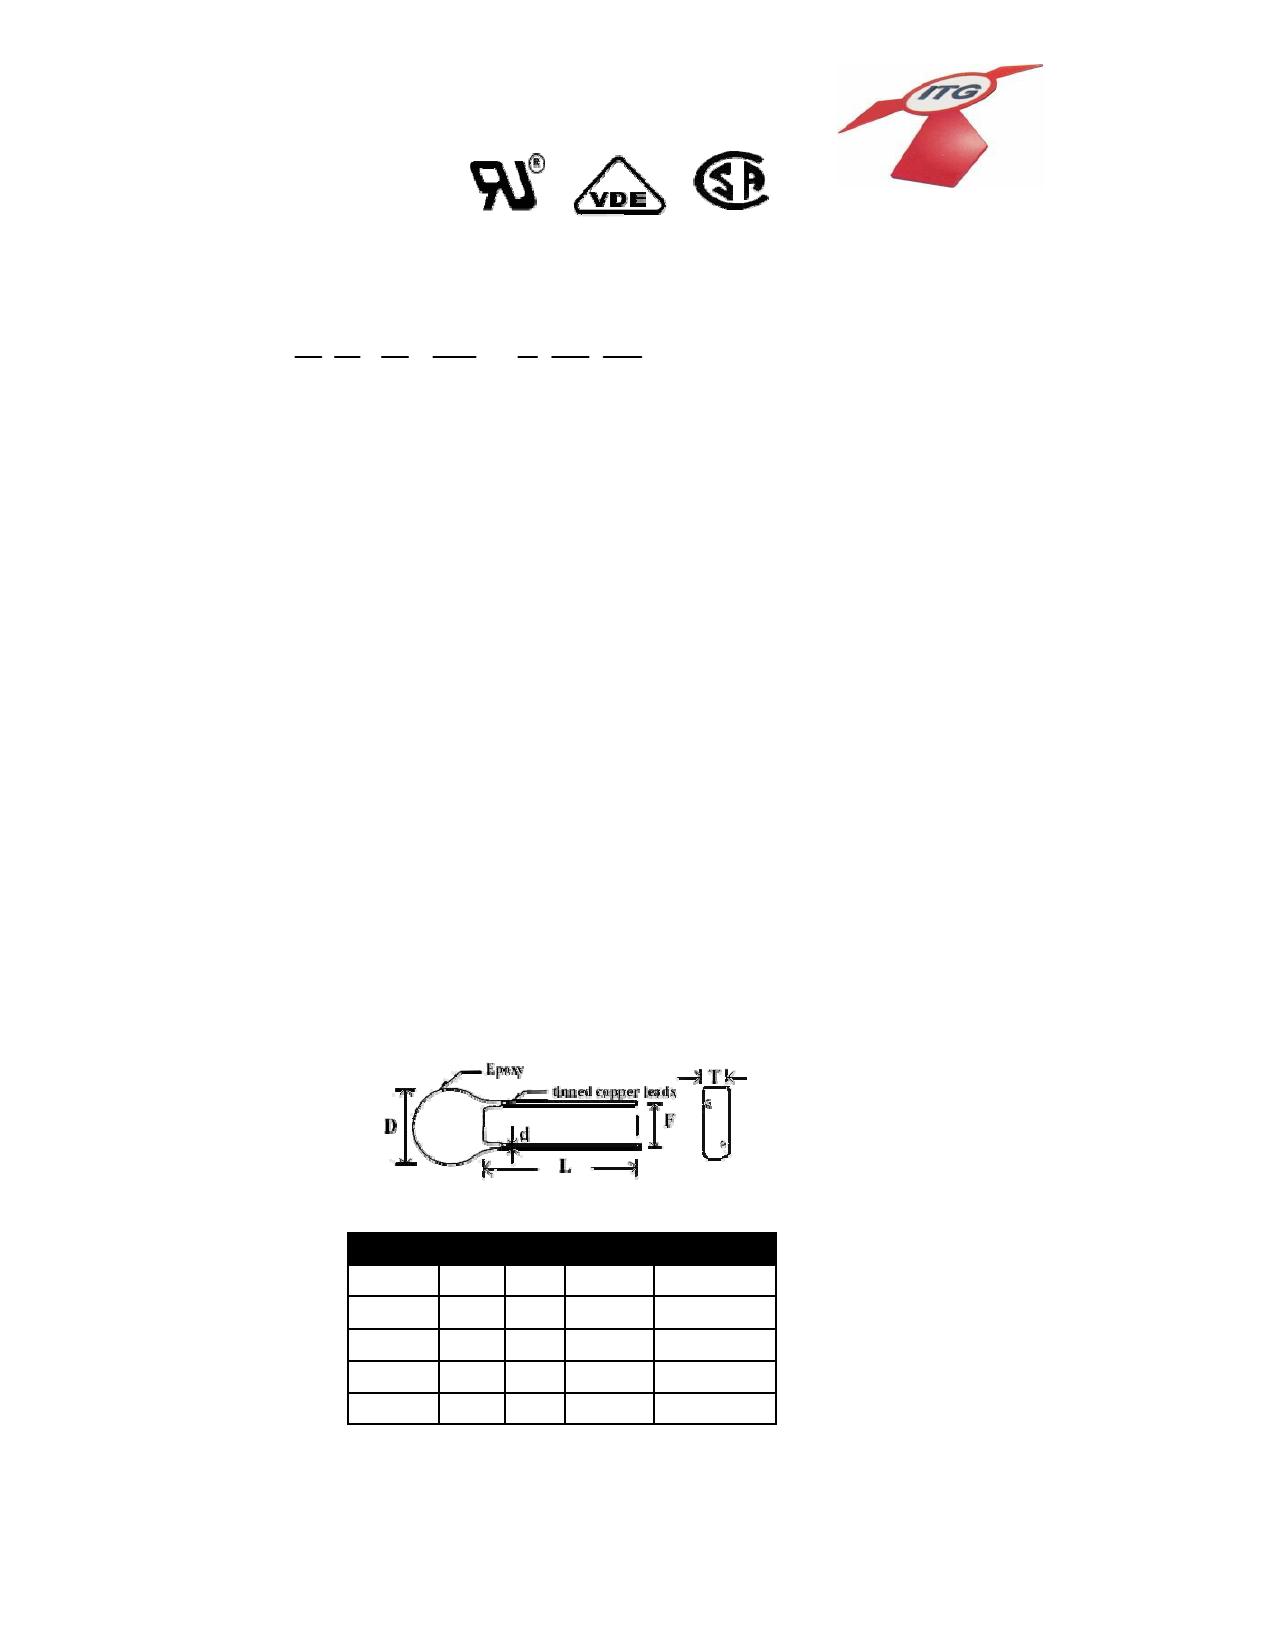 V05K230-5 datasheet